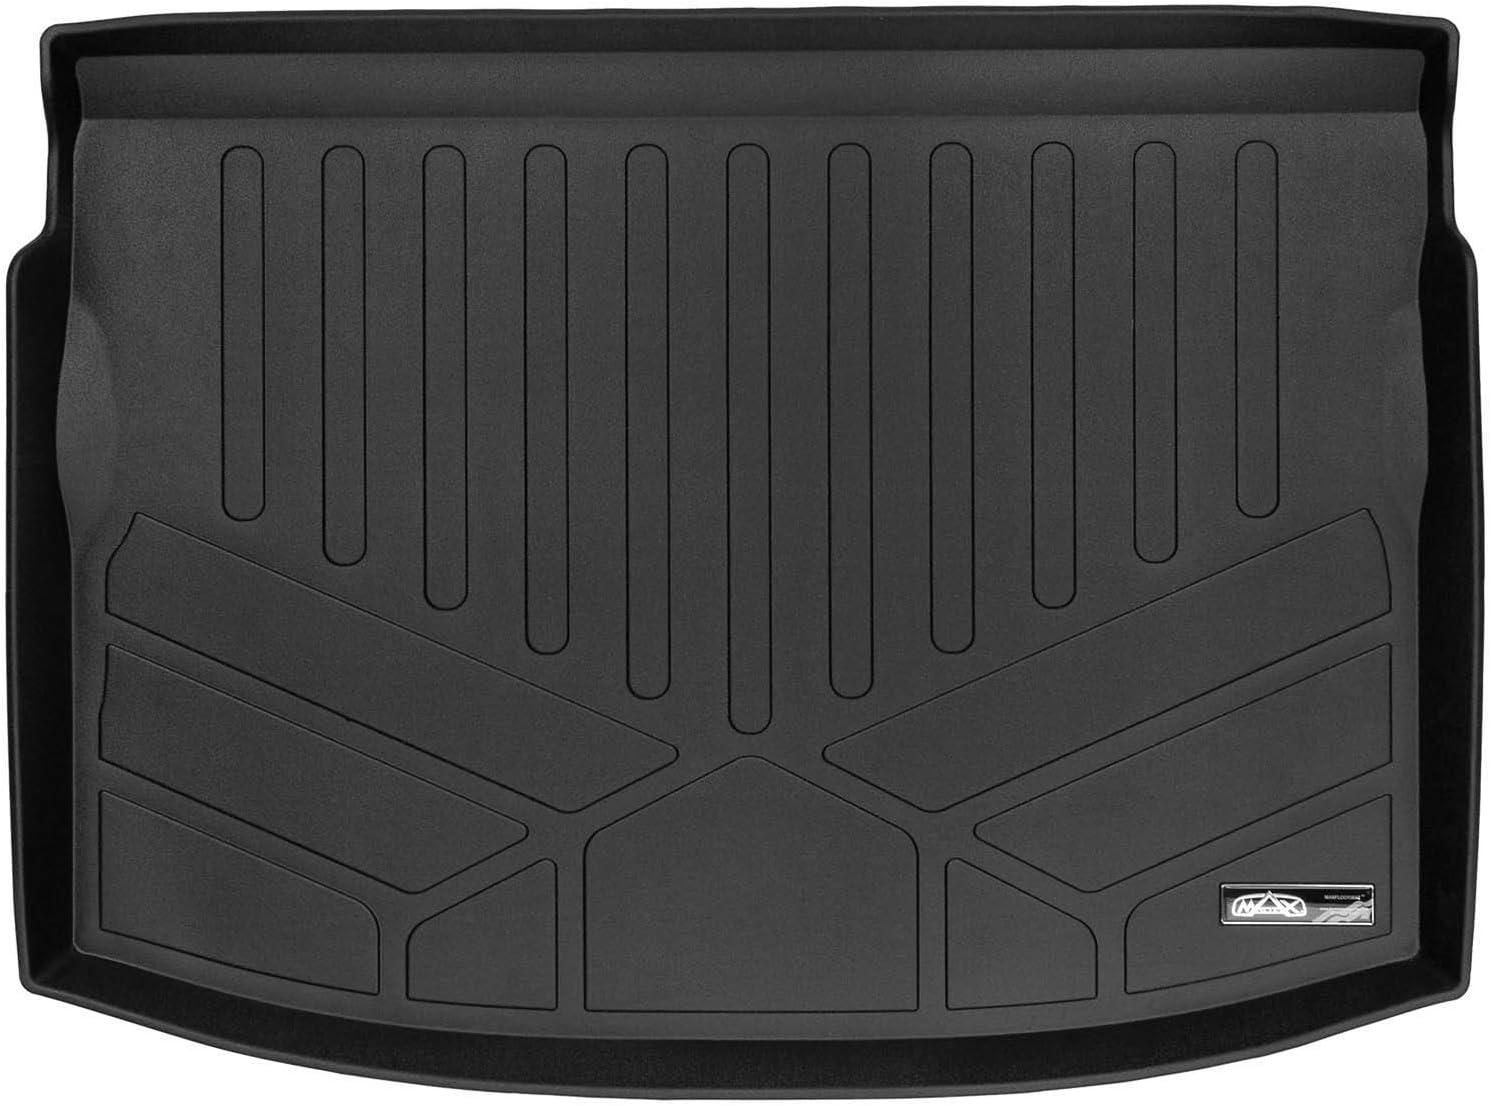 No Sedan and Crosstrek All Models SMARTLINER All Weather Cargo Liner Floor Mat Black for 2018 Subaru Impreza Hatchback